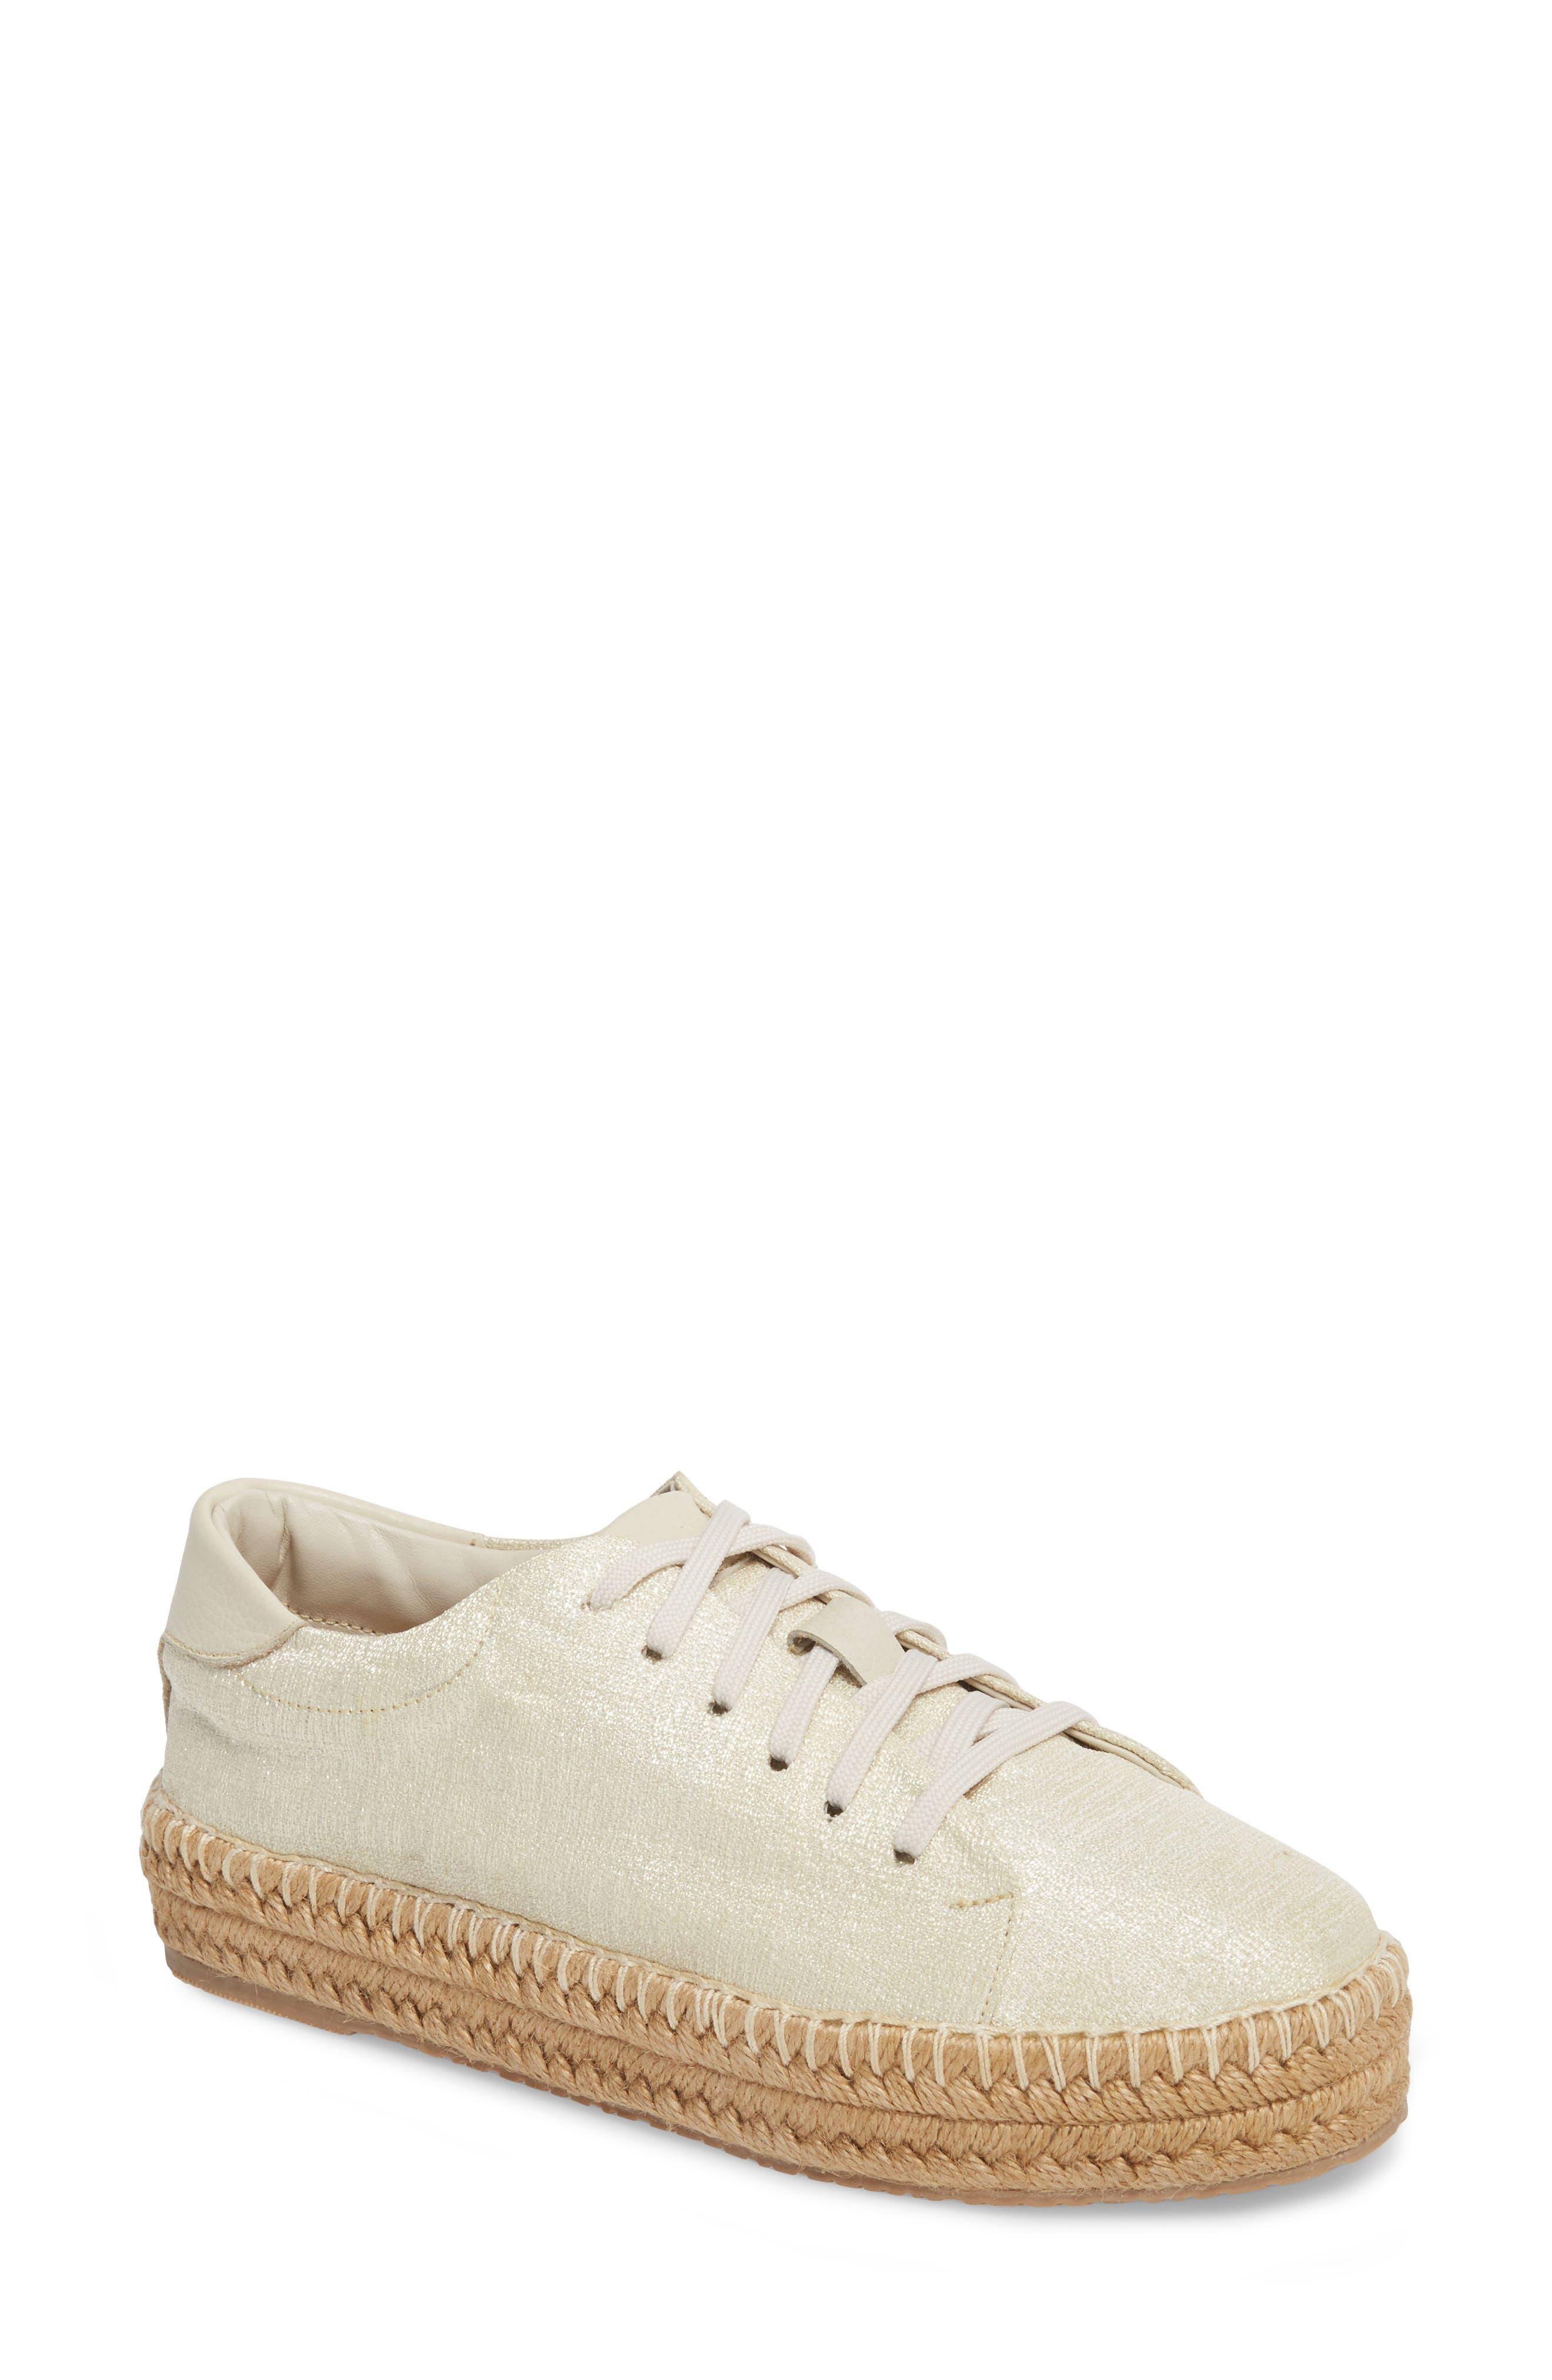 Nogales Sneaker Espadrille,                         Main,                         color, Ivory